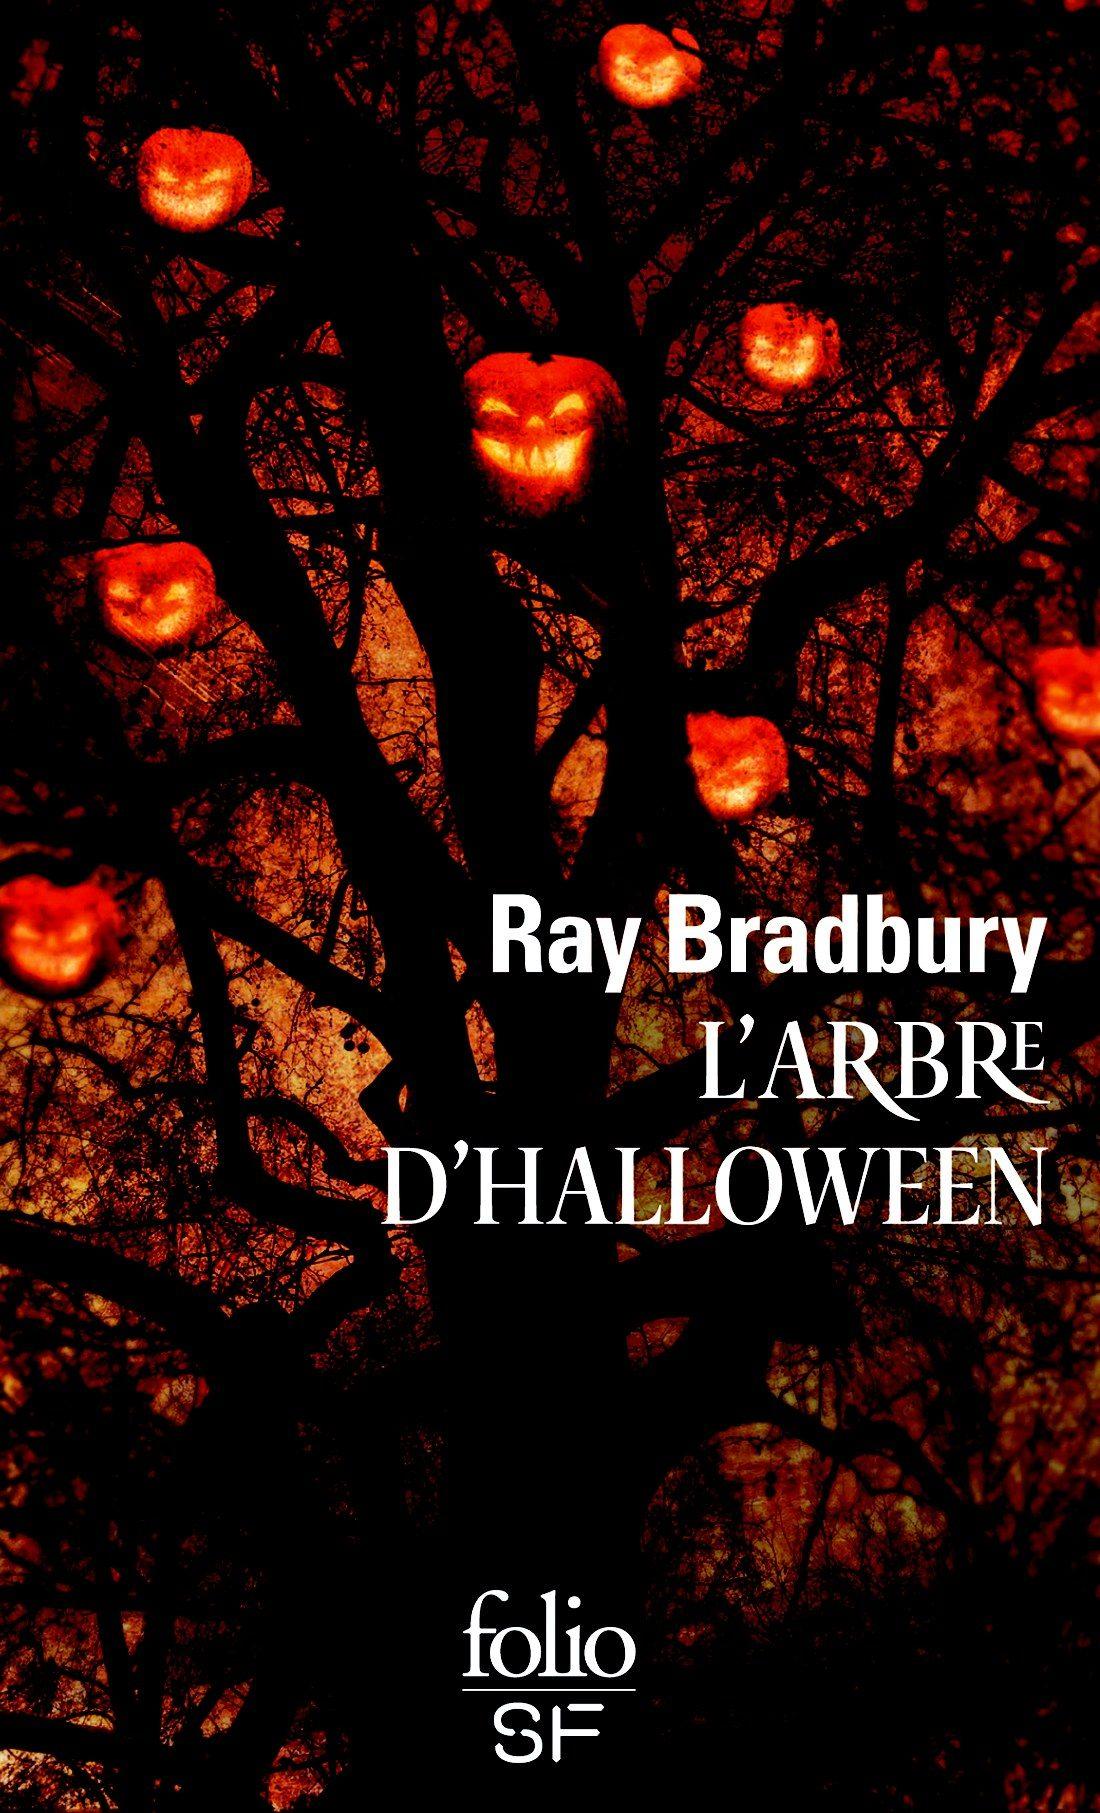 Ray Bradbury, L'Arbre d'Halloween